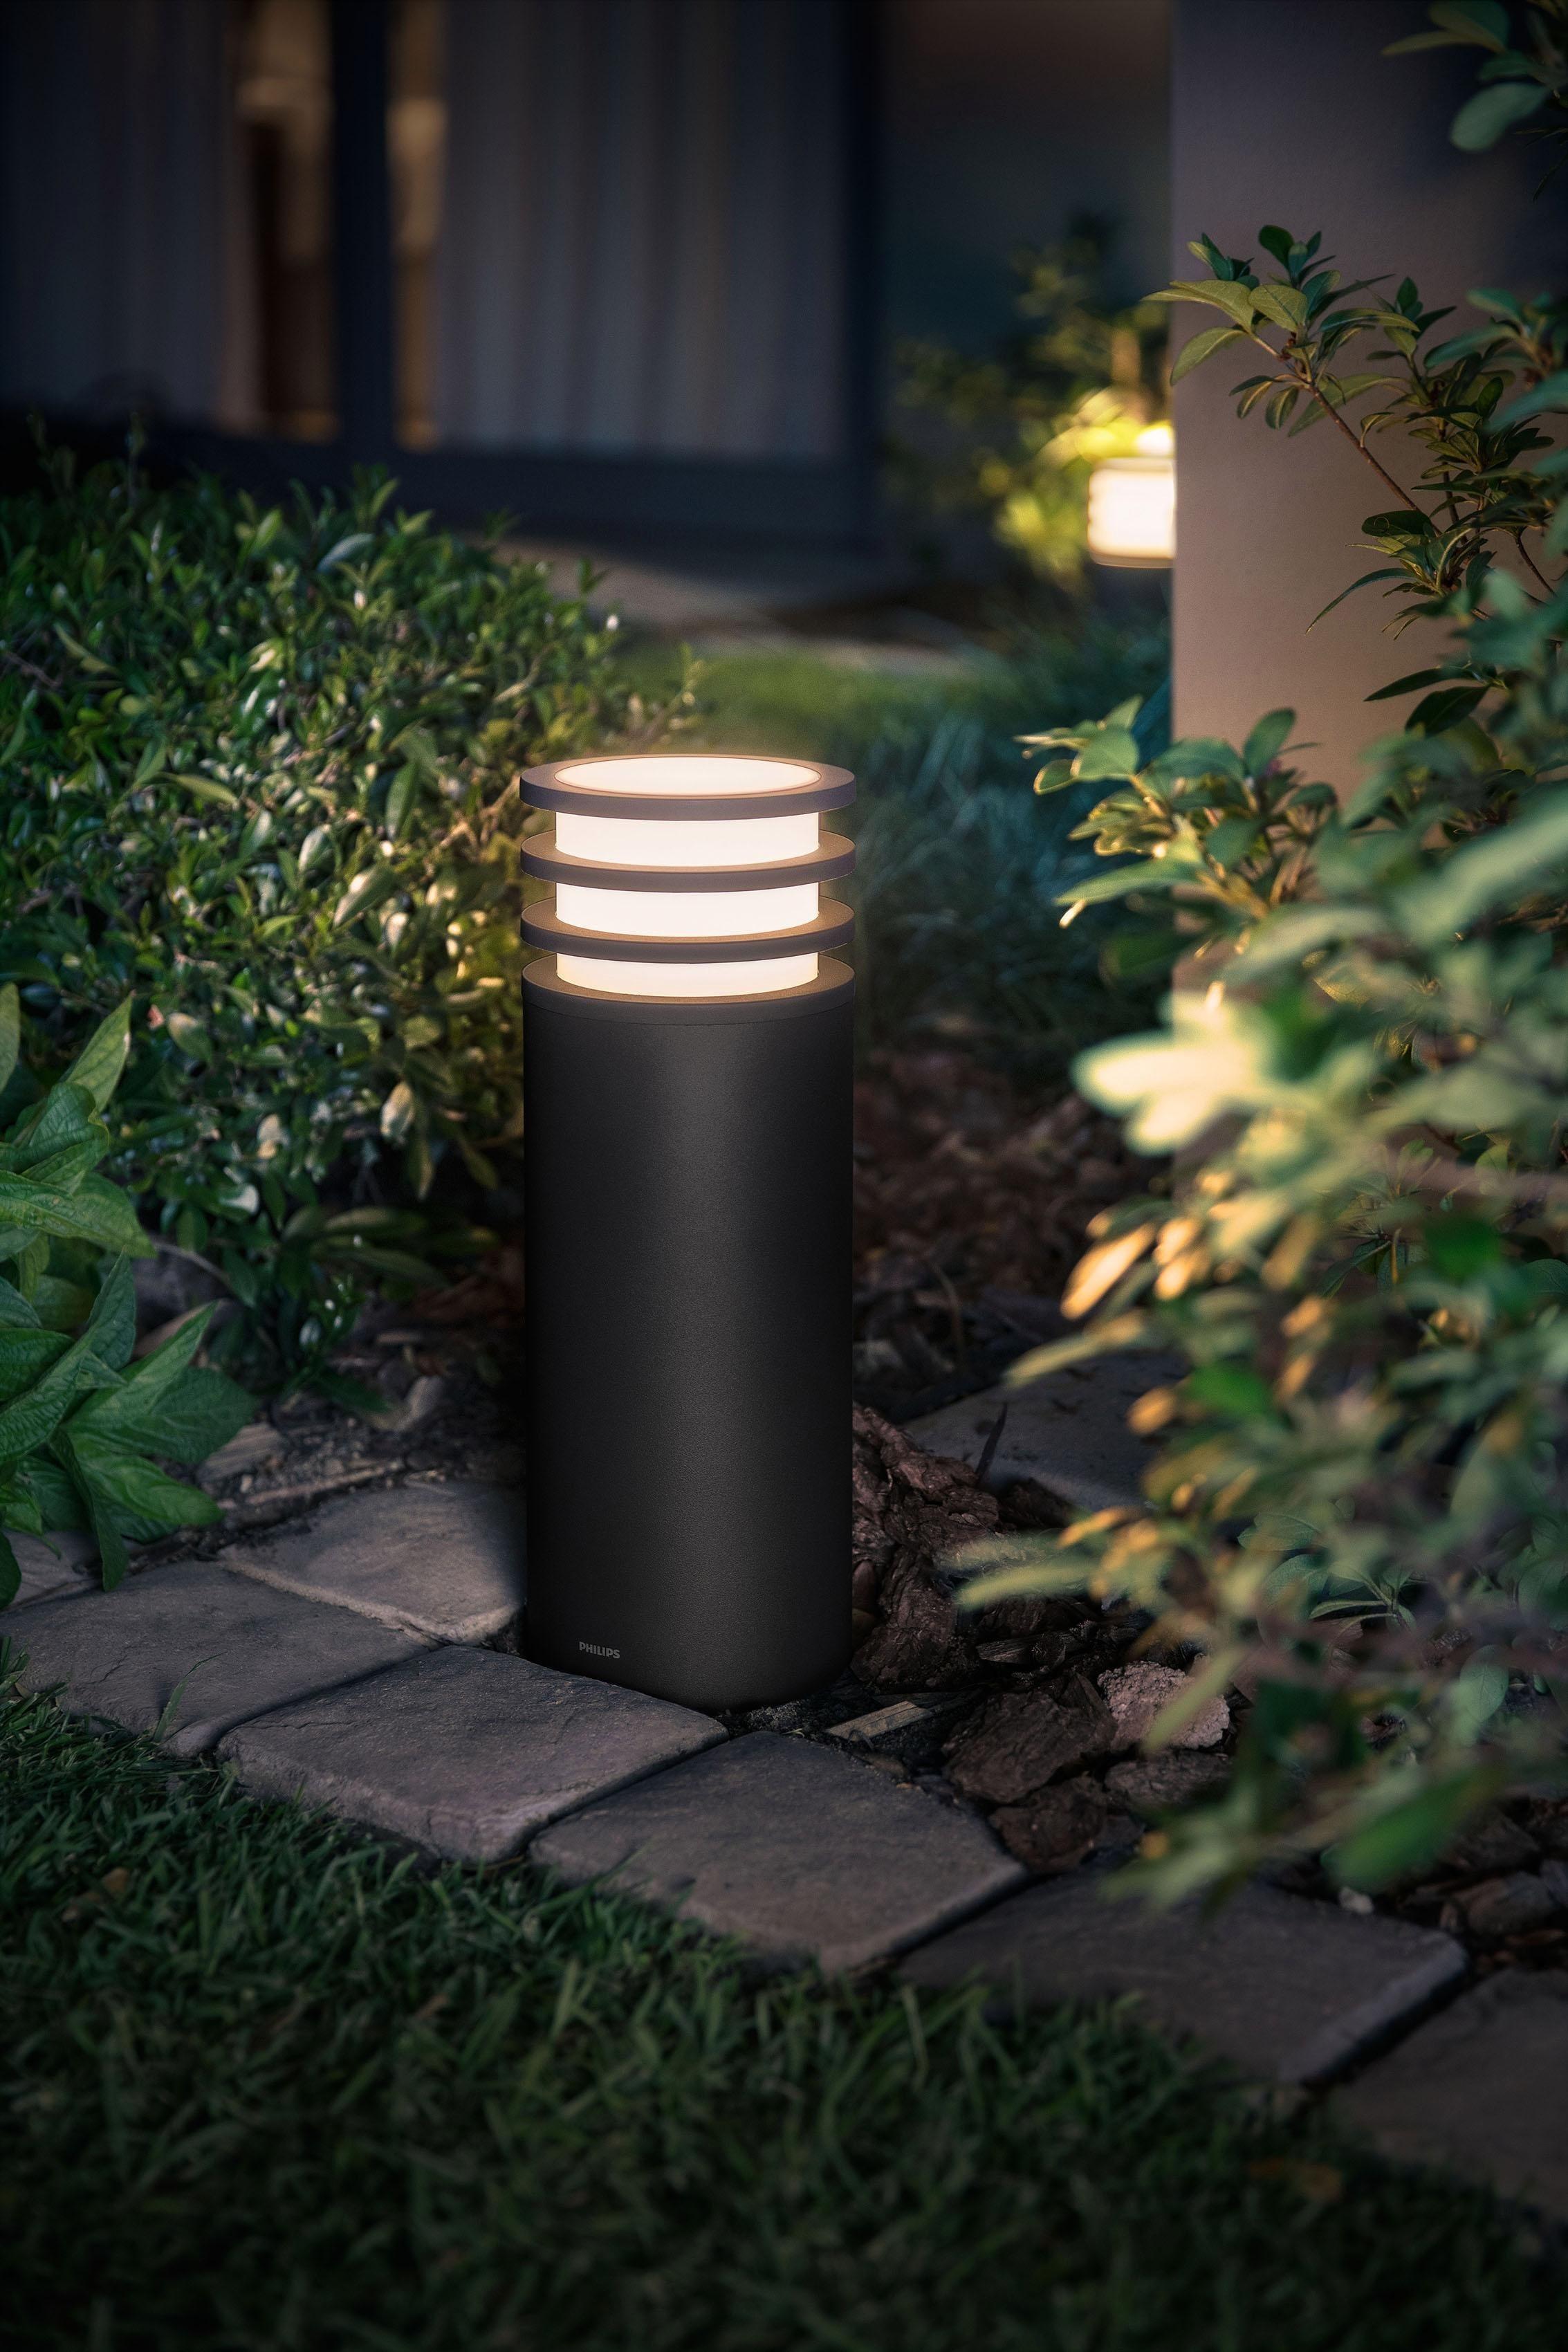 LED Sockelleuchte »Lucca«, 1-flammig, LED Außenleuchte - smartes LED-Lichtsystem mit App-Steuerung